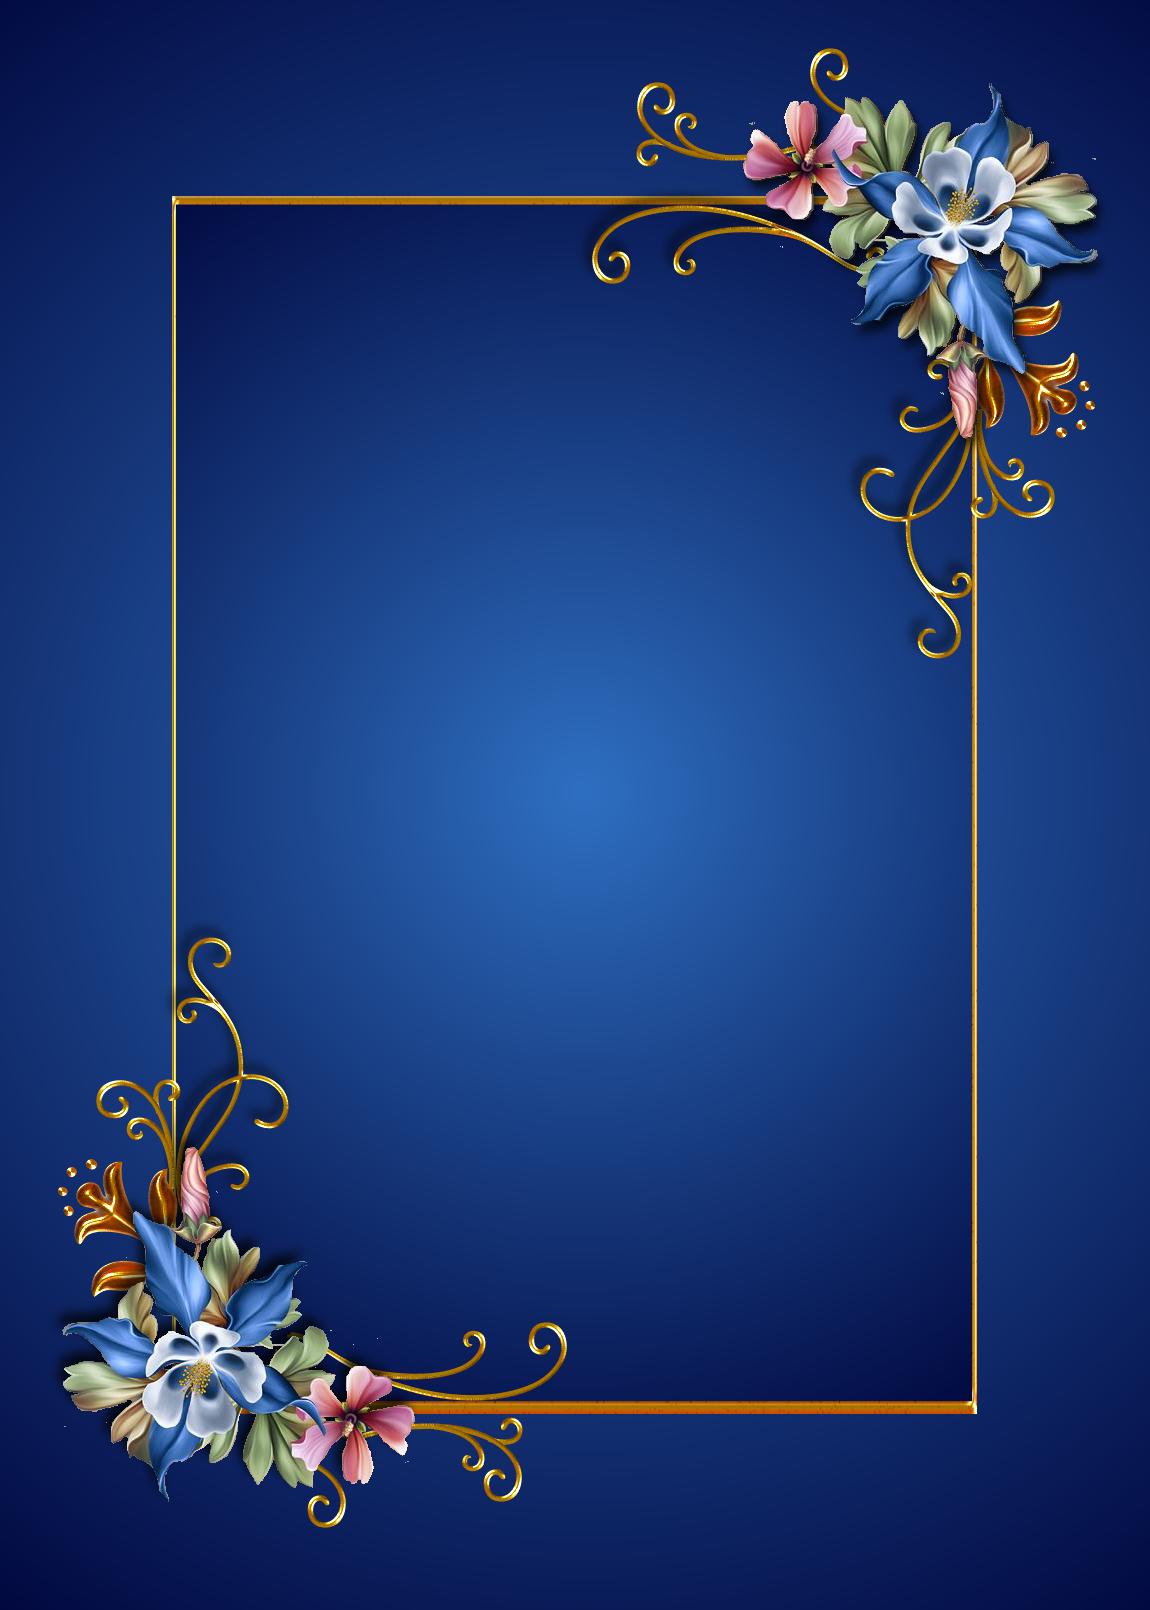 blue floral on blue backgrounds free